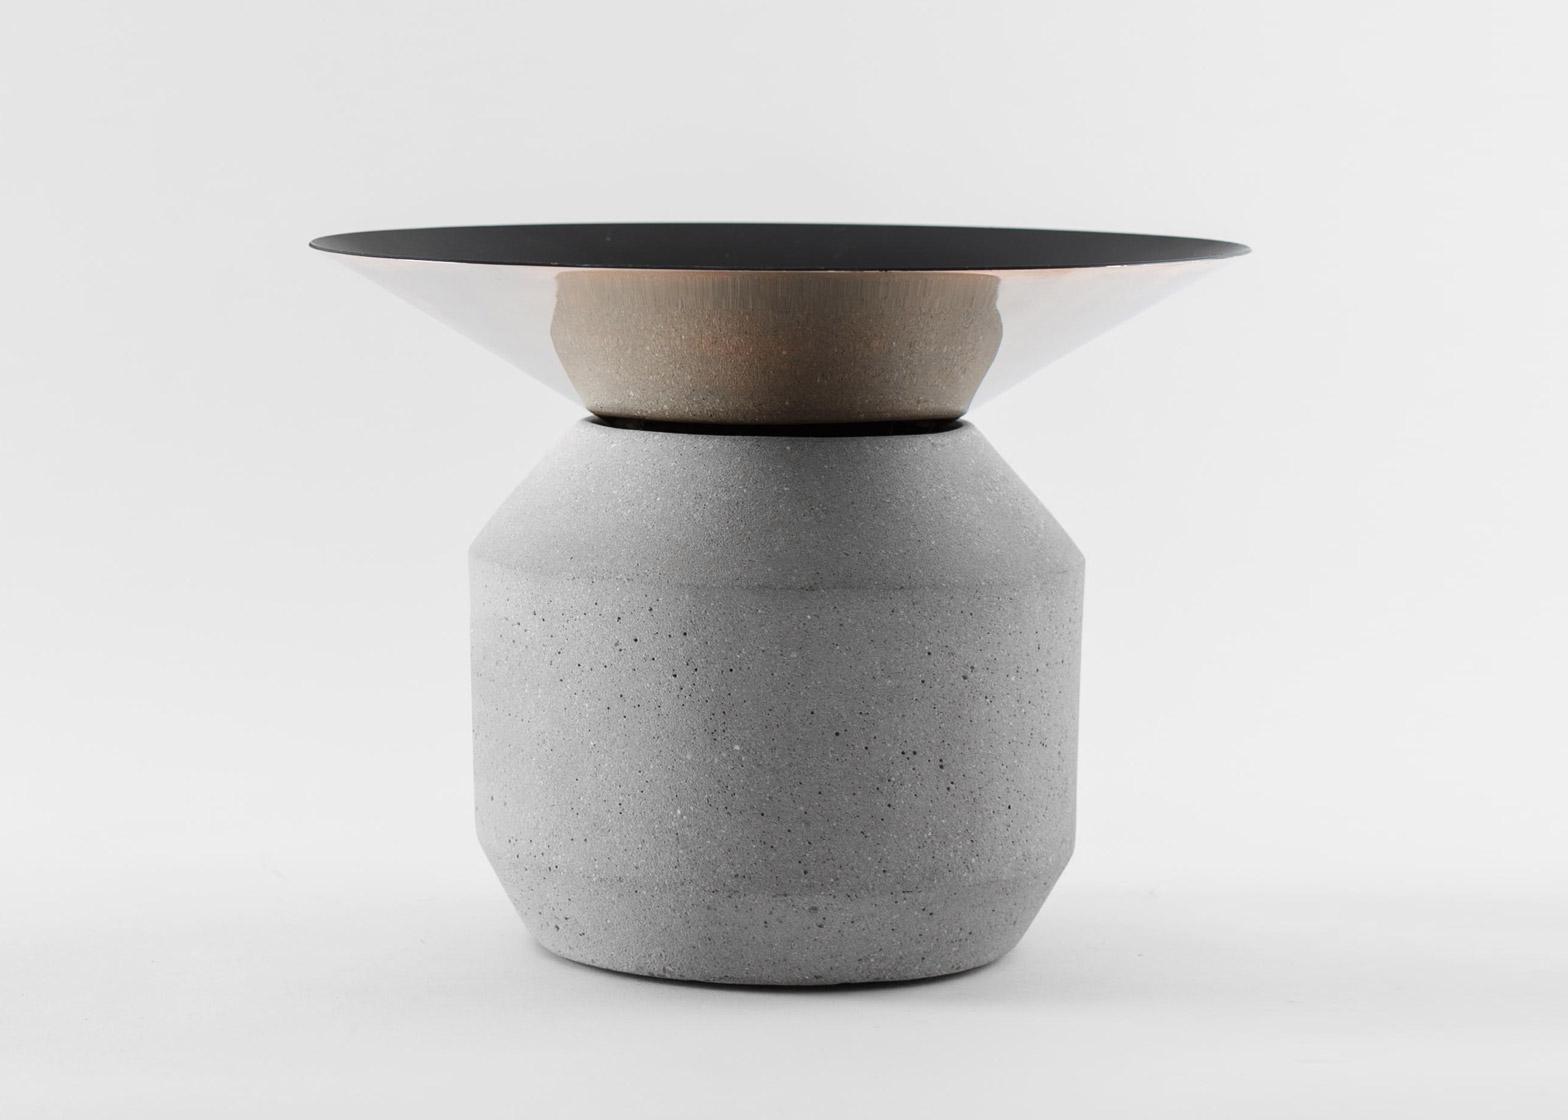 Radial vases by La Selva